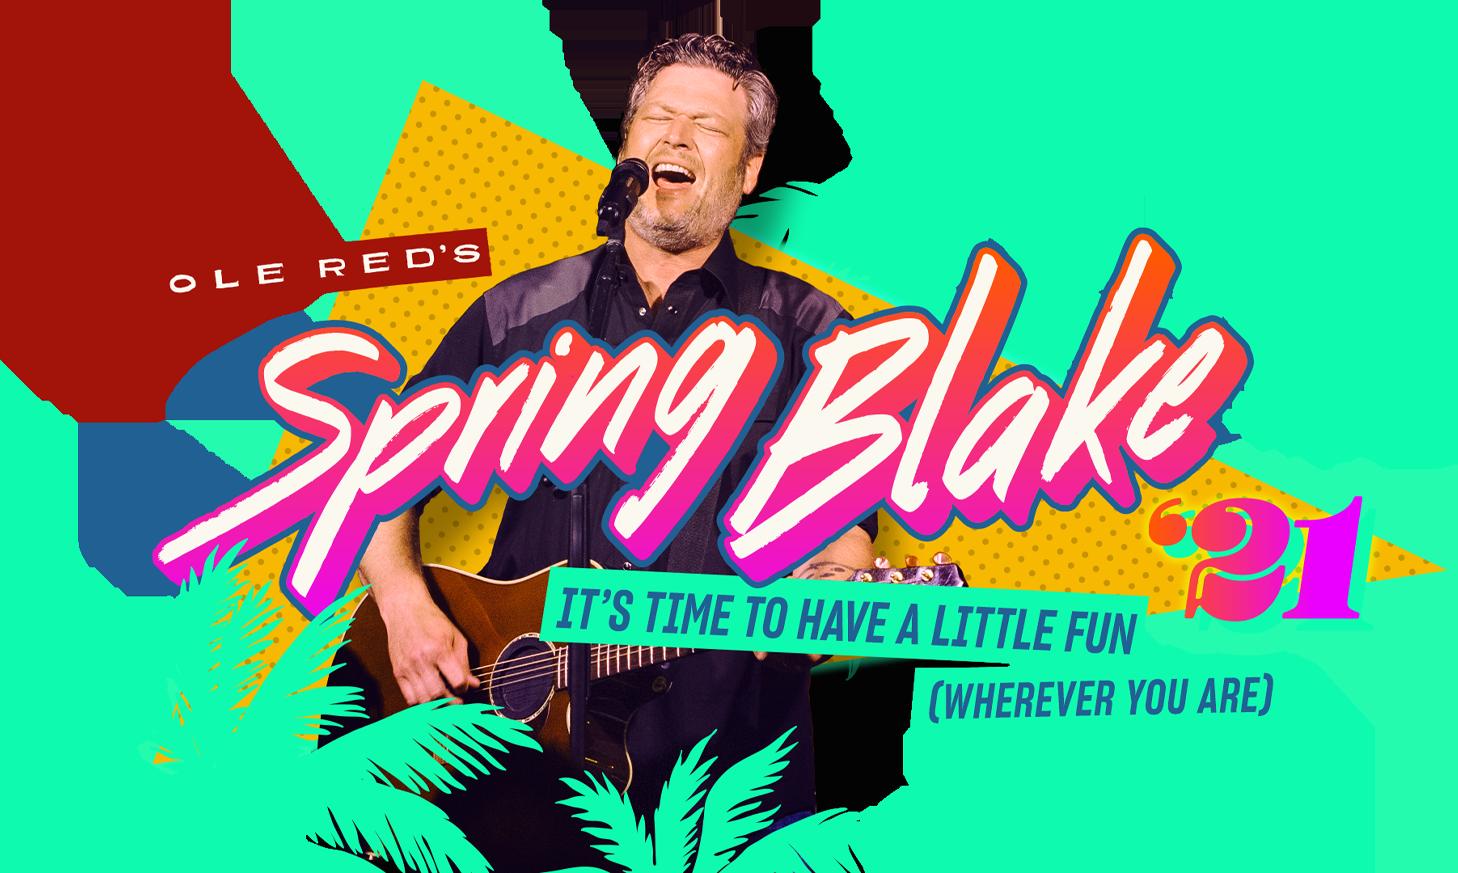 Spring Blake 2021 Sweepstakes Restaurant